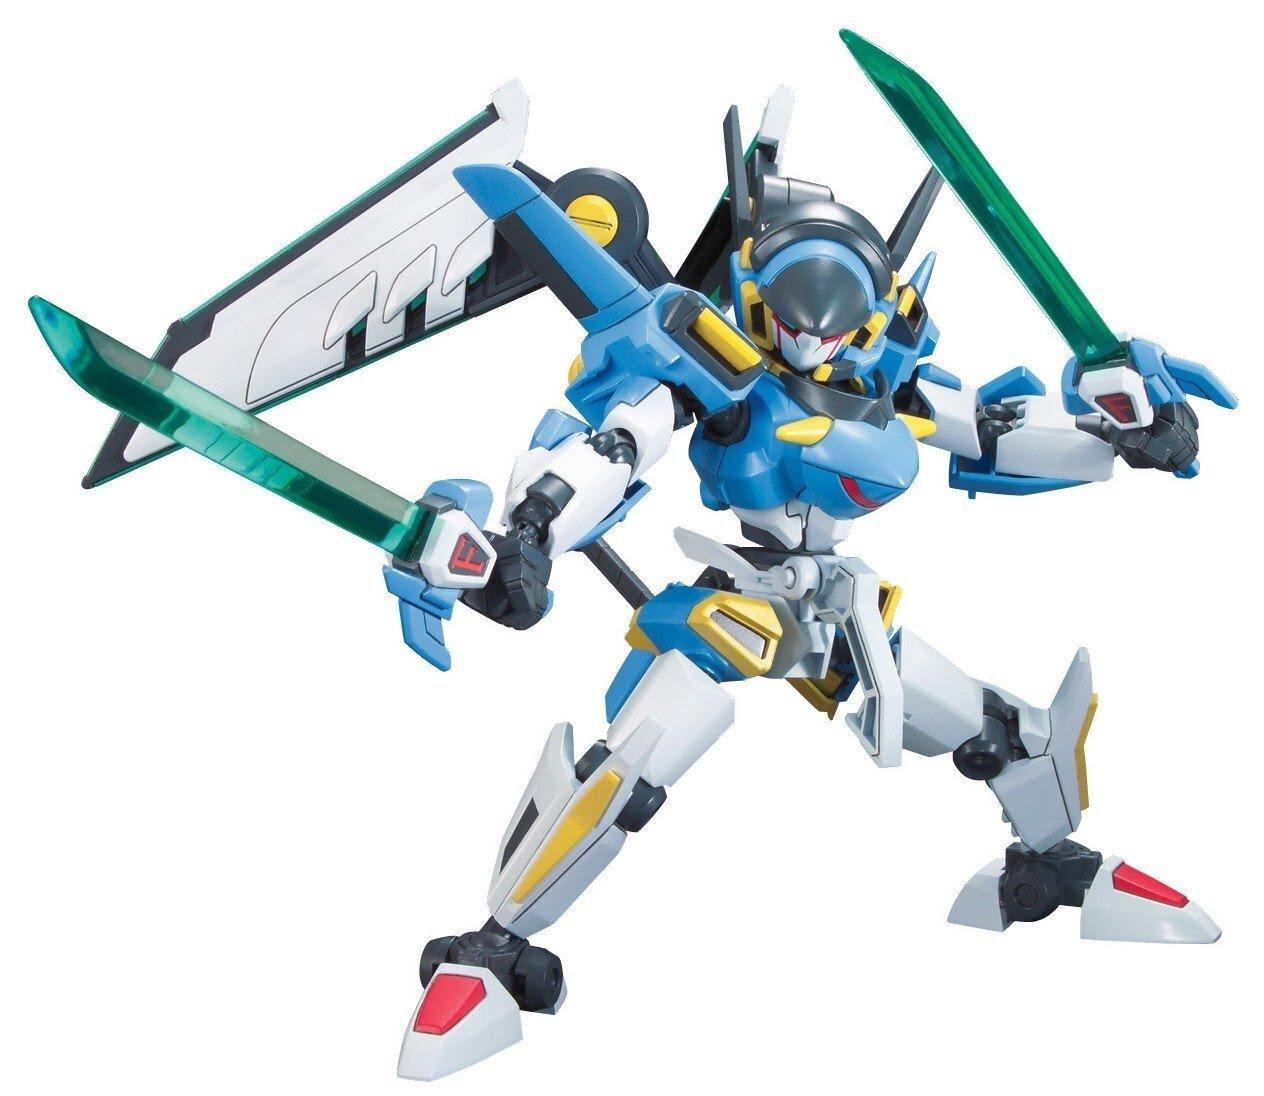 Đấu sĩ LBX-030 Ikaros Force